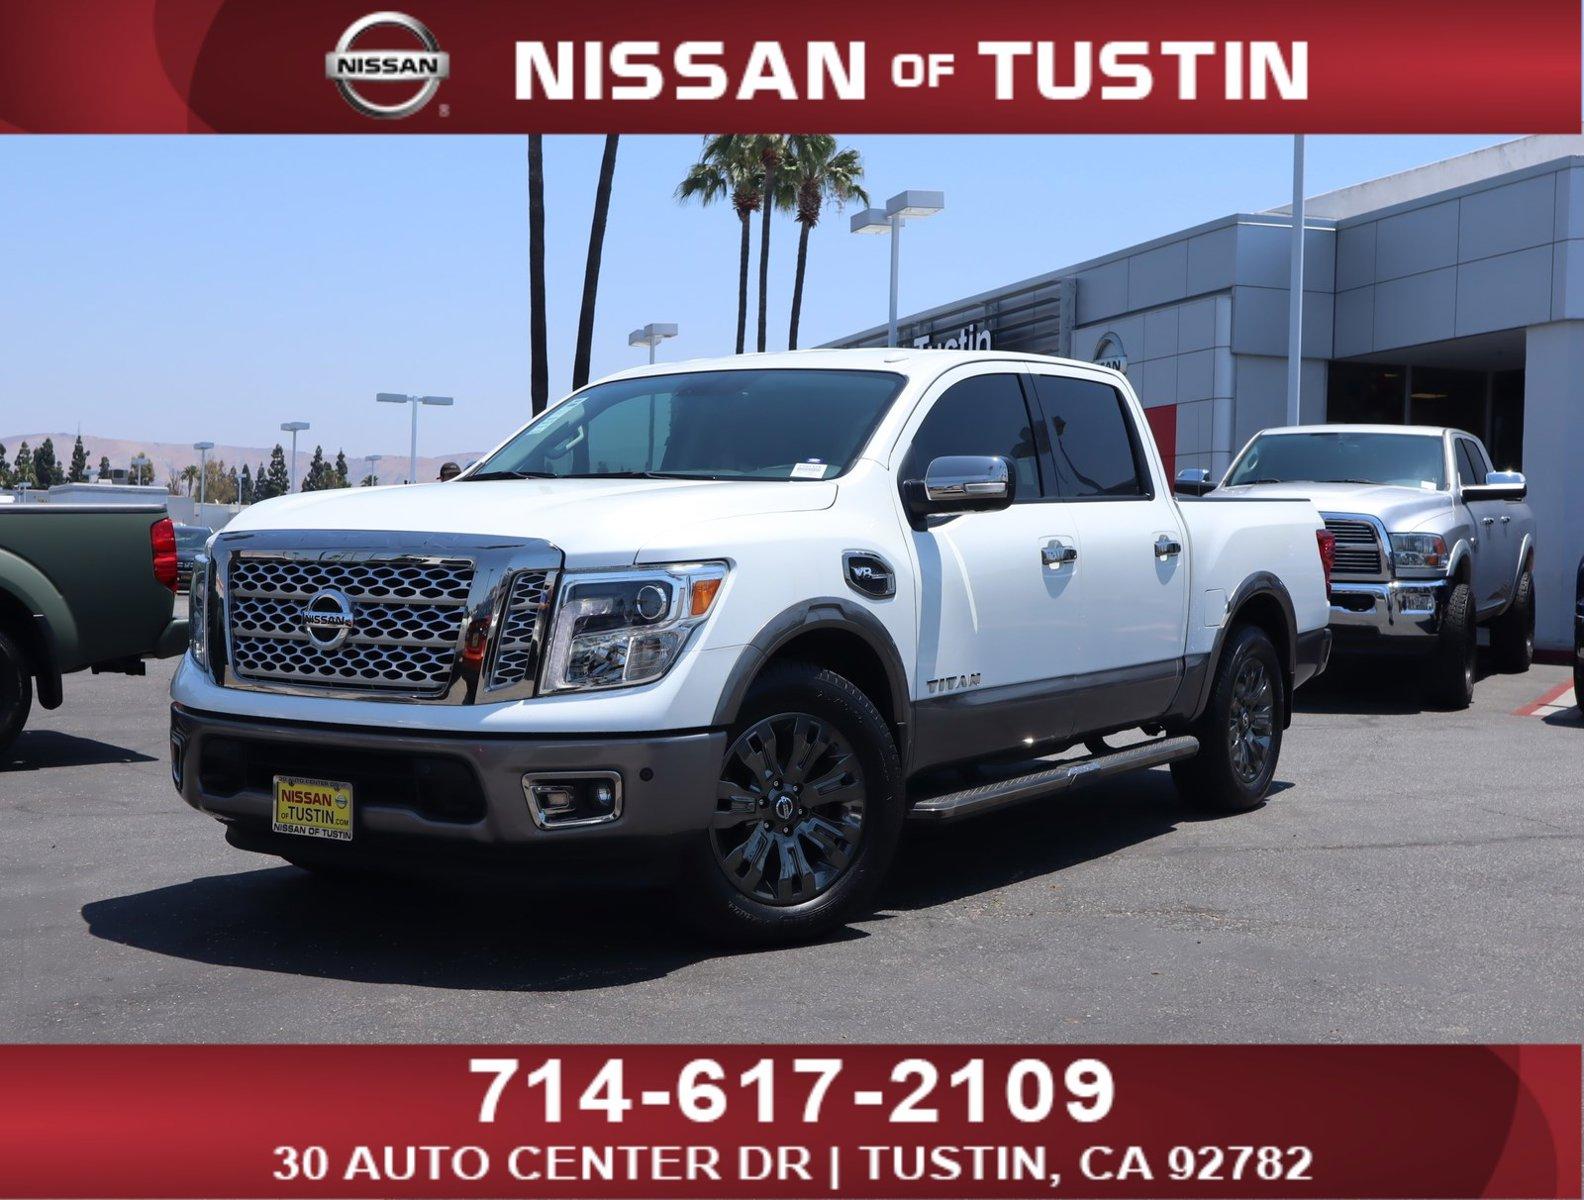 2017 Nissan Titan Platinum Reserve 4x2 Crew Cab Platinum Reserve Regular Unleaded V-8 5.6 L/339 [0]